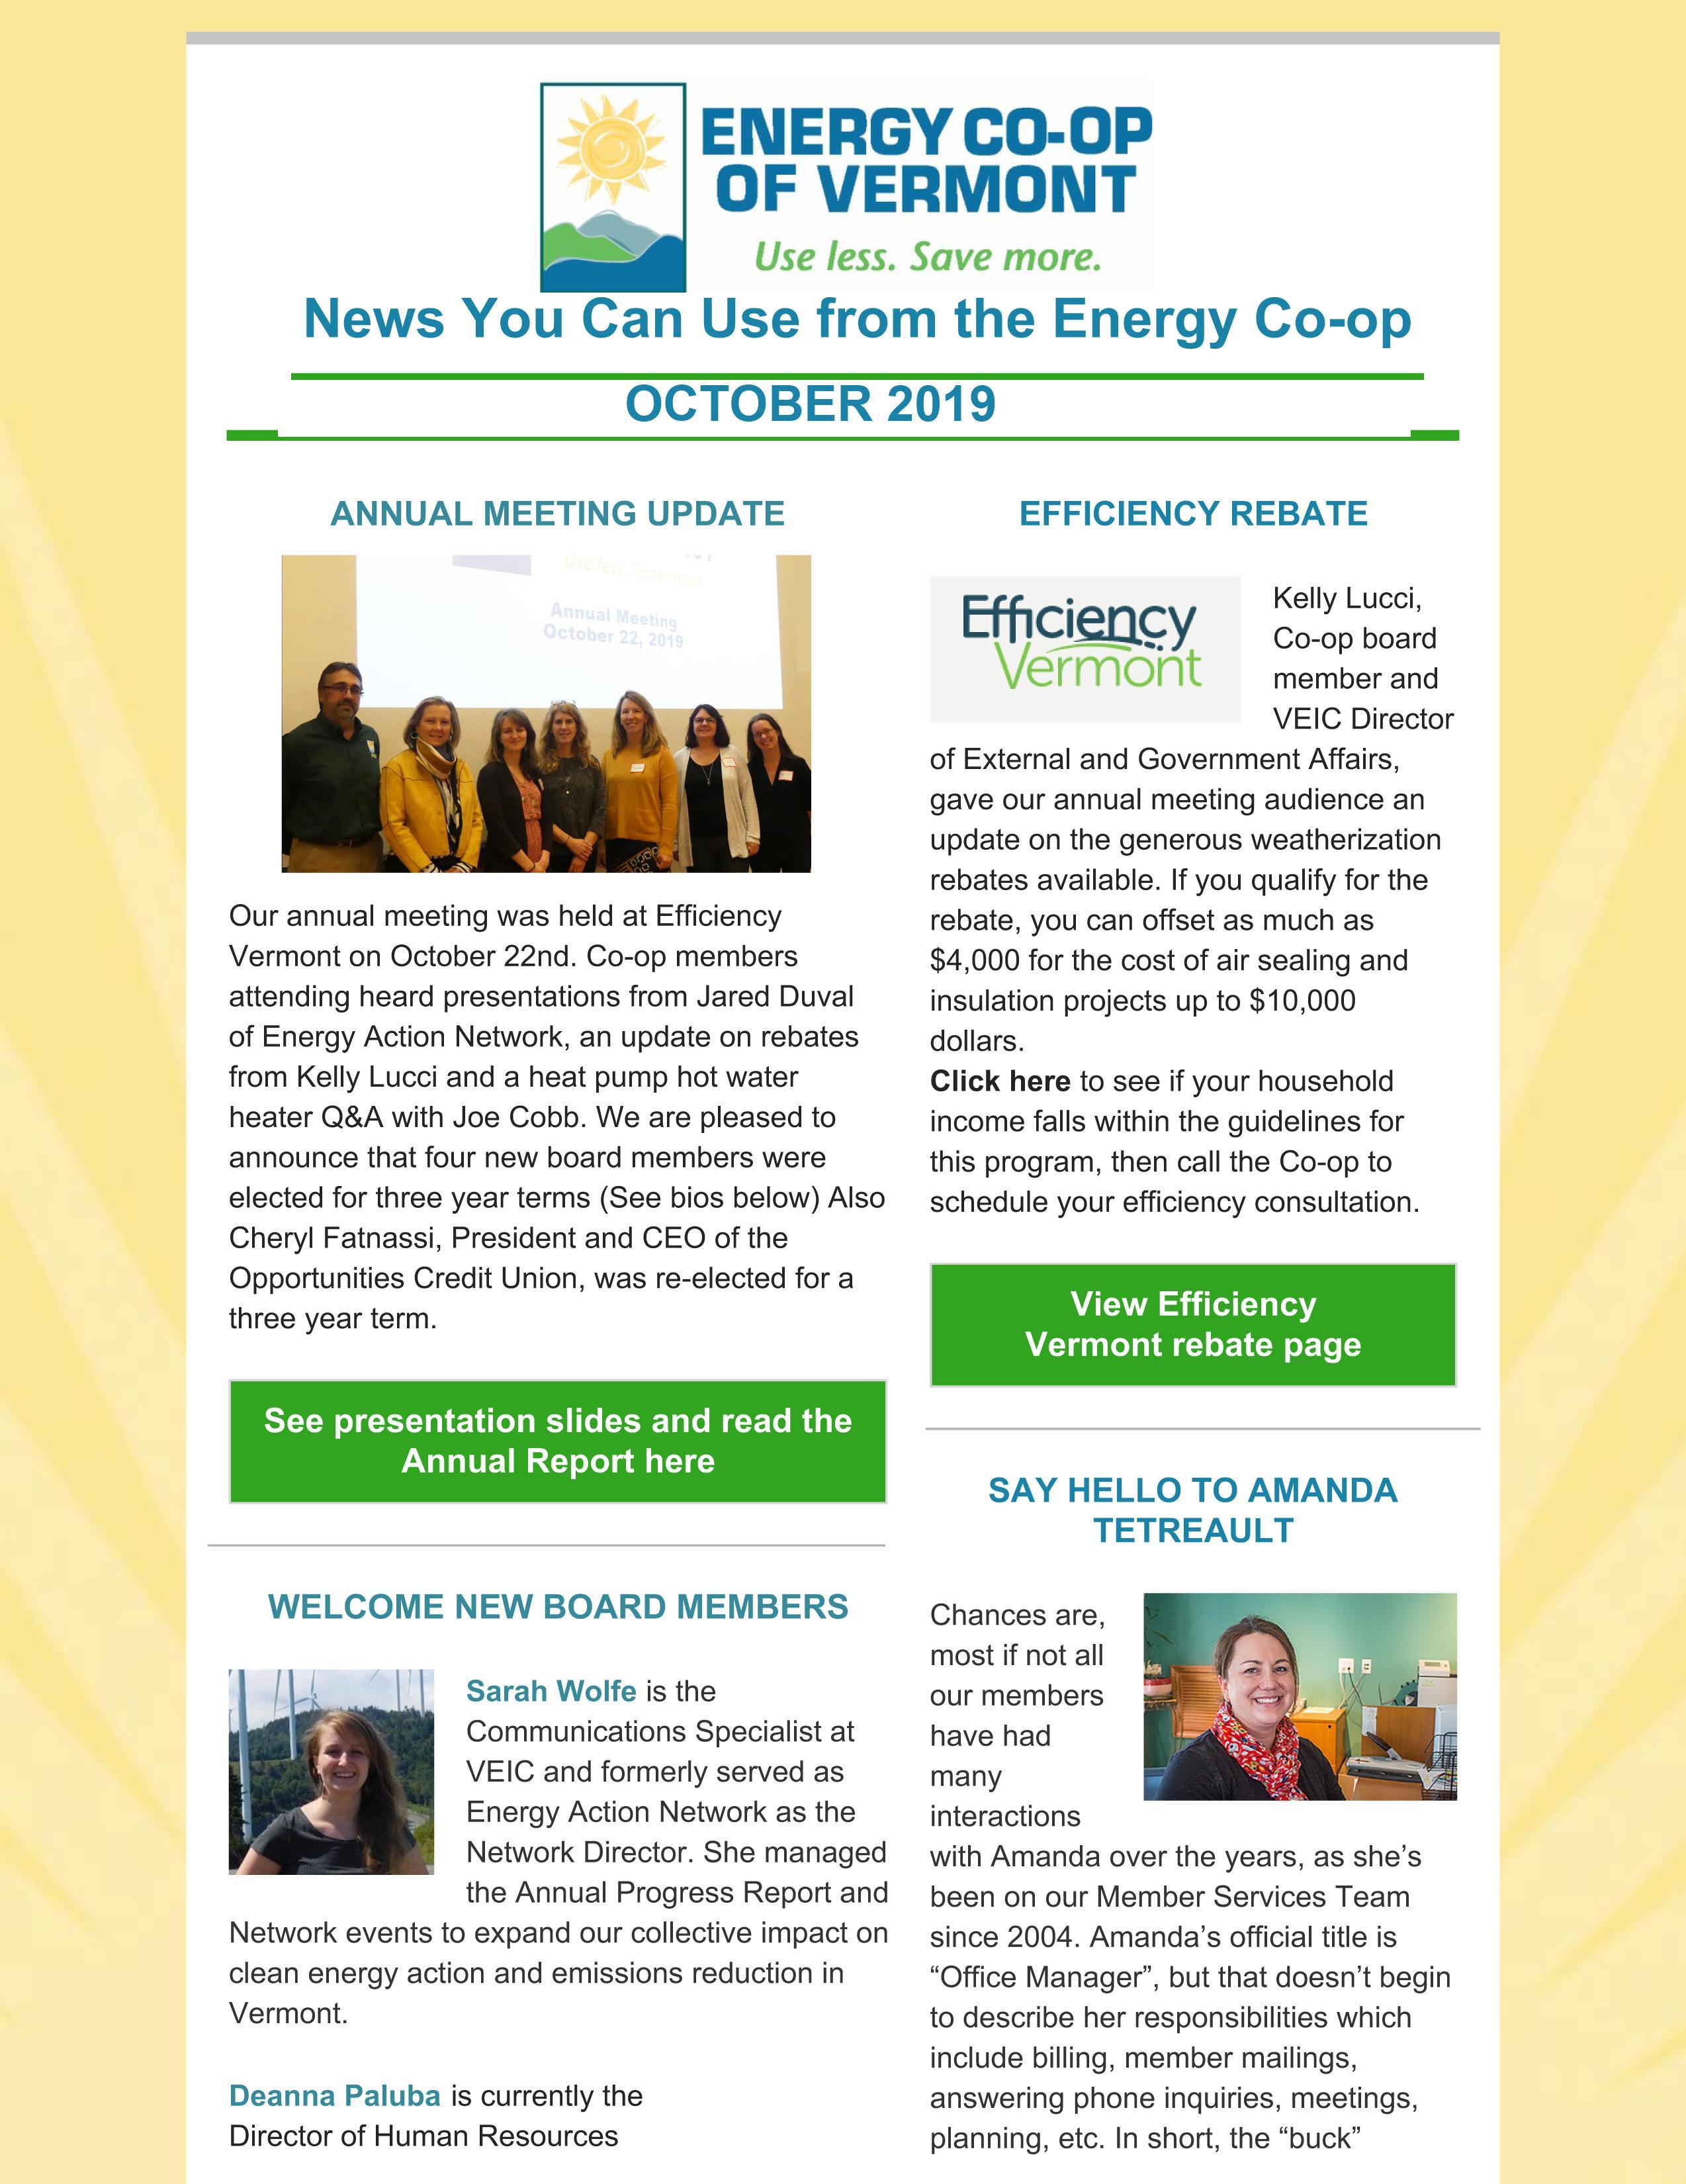 Energy Co-op of Vermont Newsletter October 2019